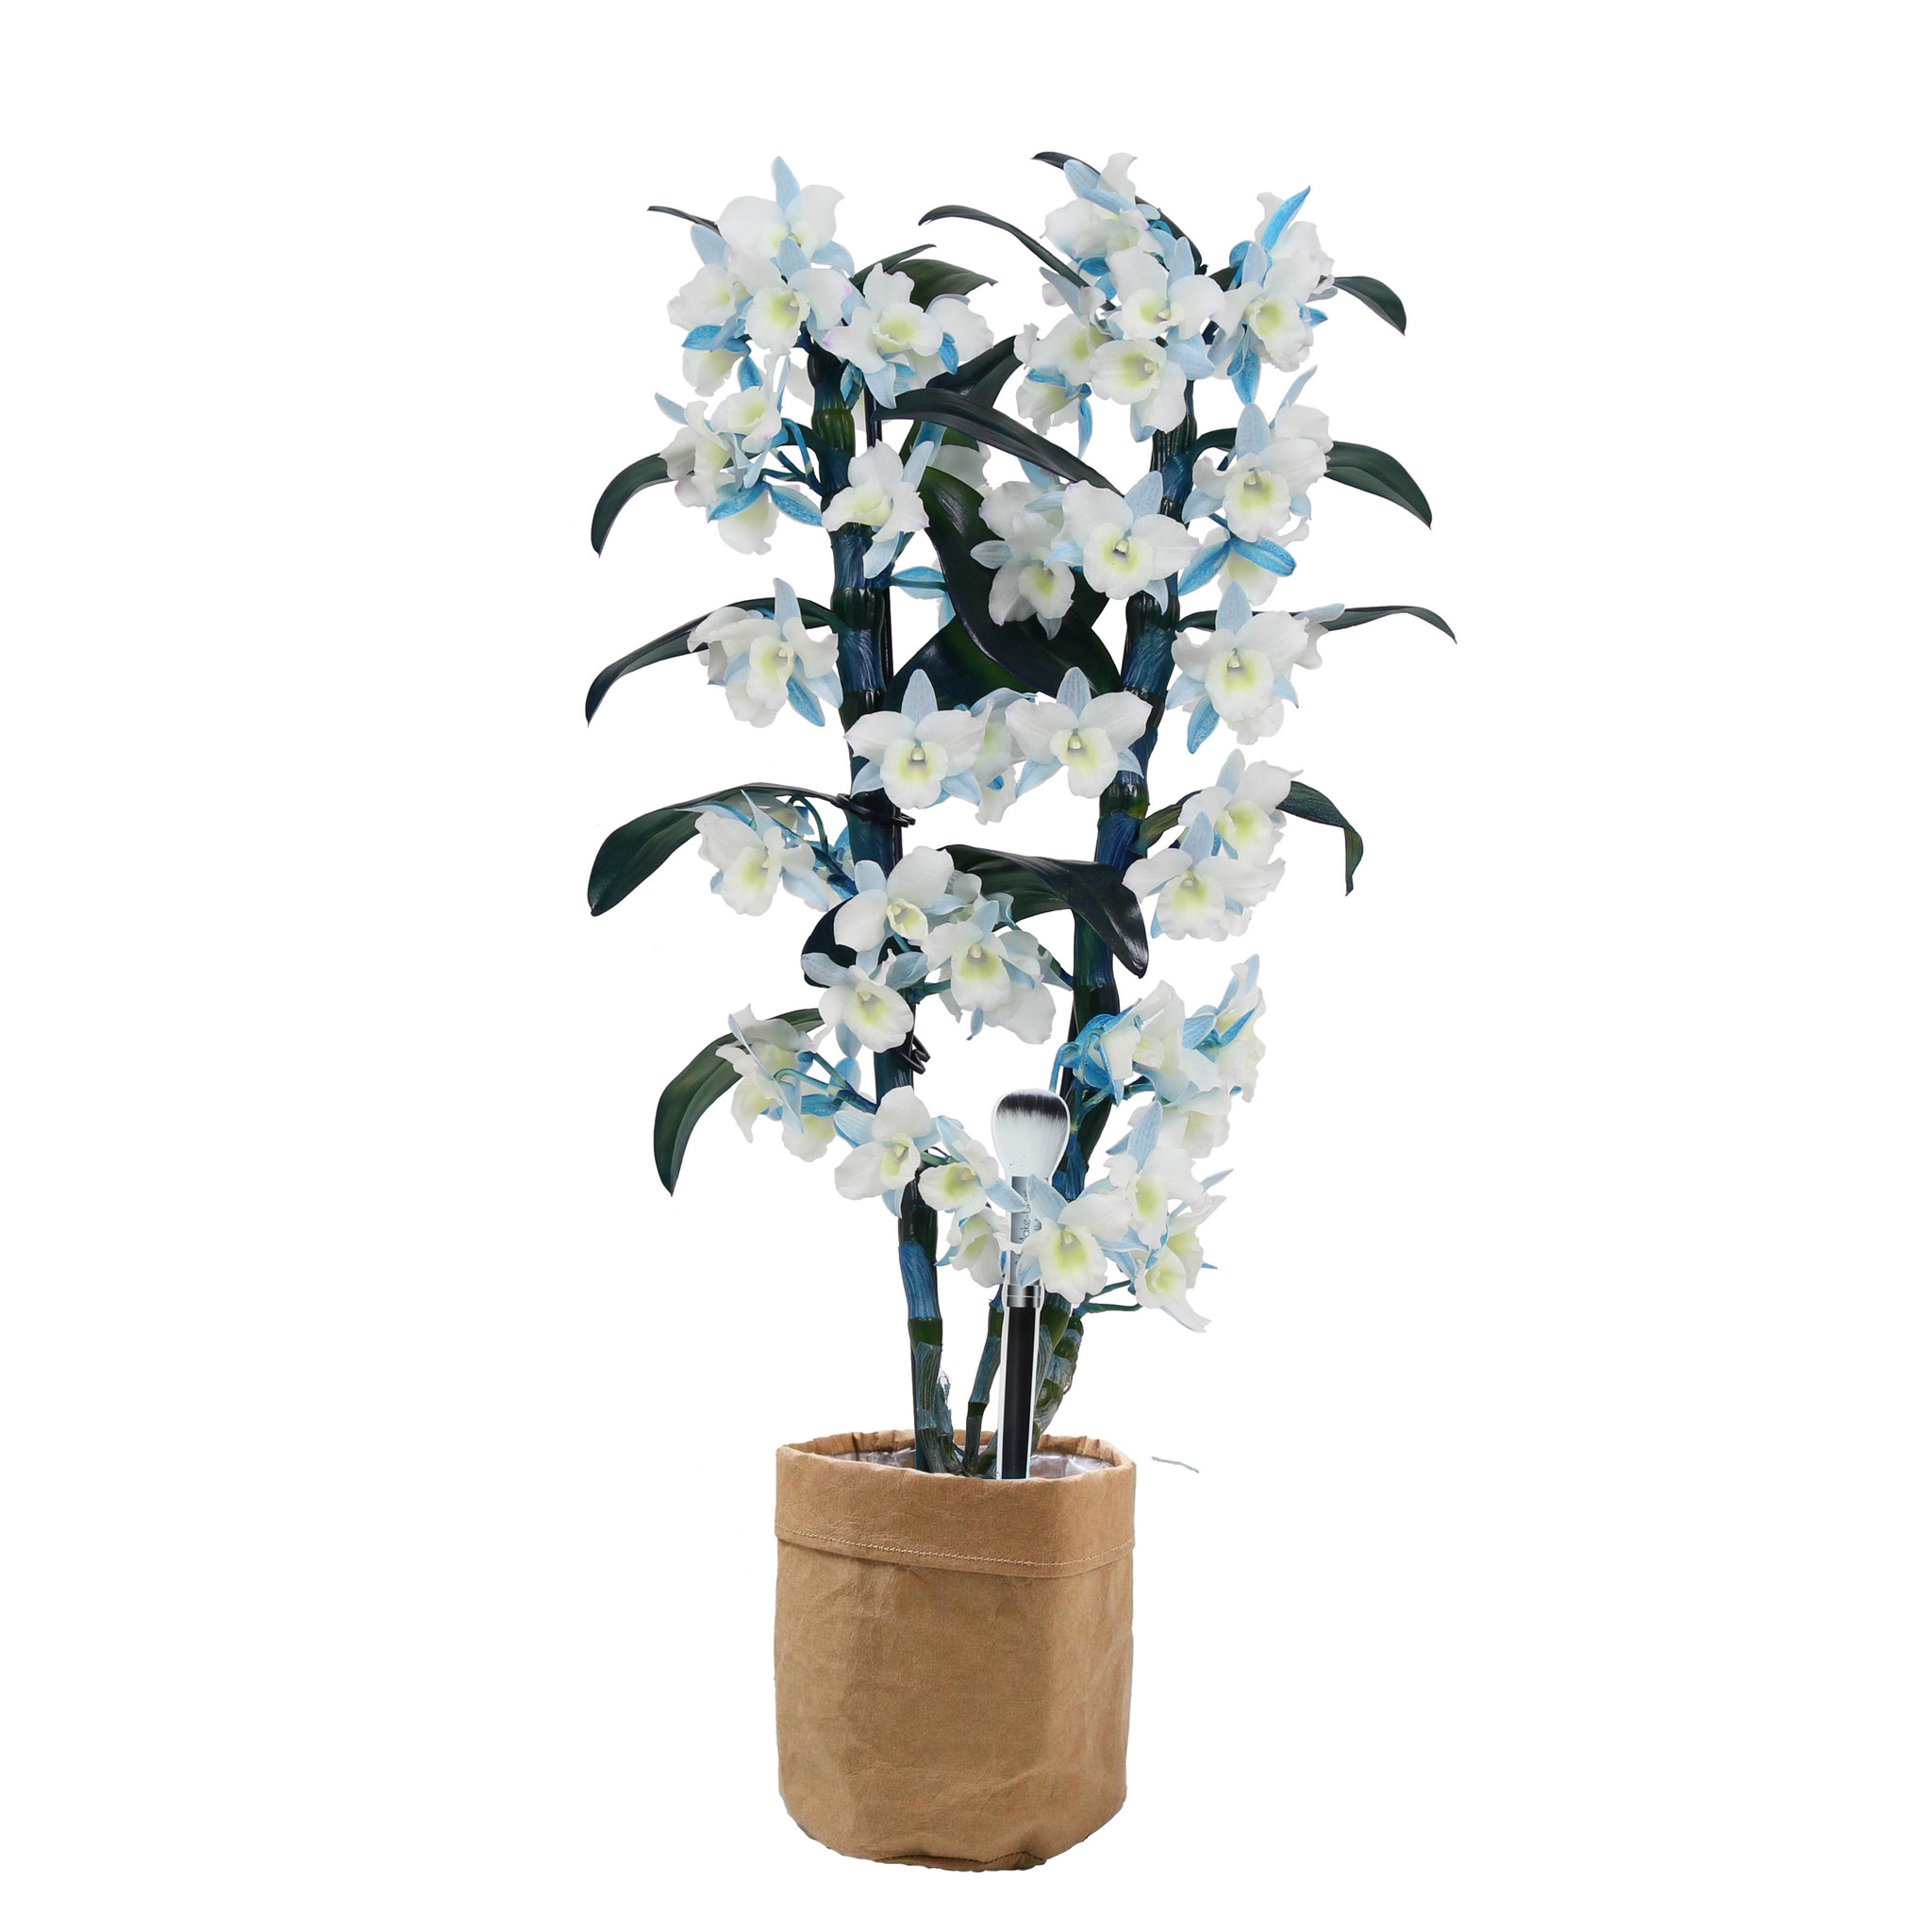 Bamboo orchid 'Make Upz' (2-tak) in Sizo Bag (BXMB2 - 15x50 cm)